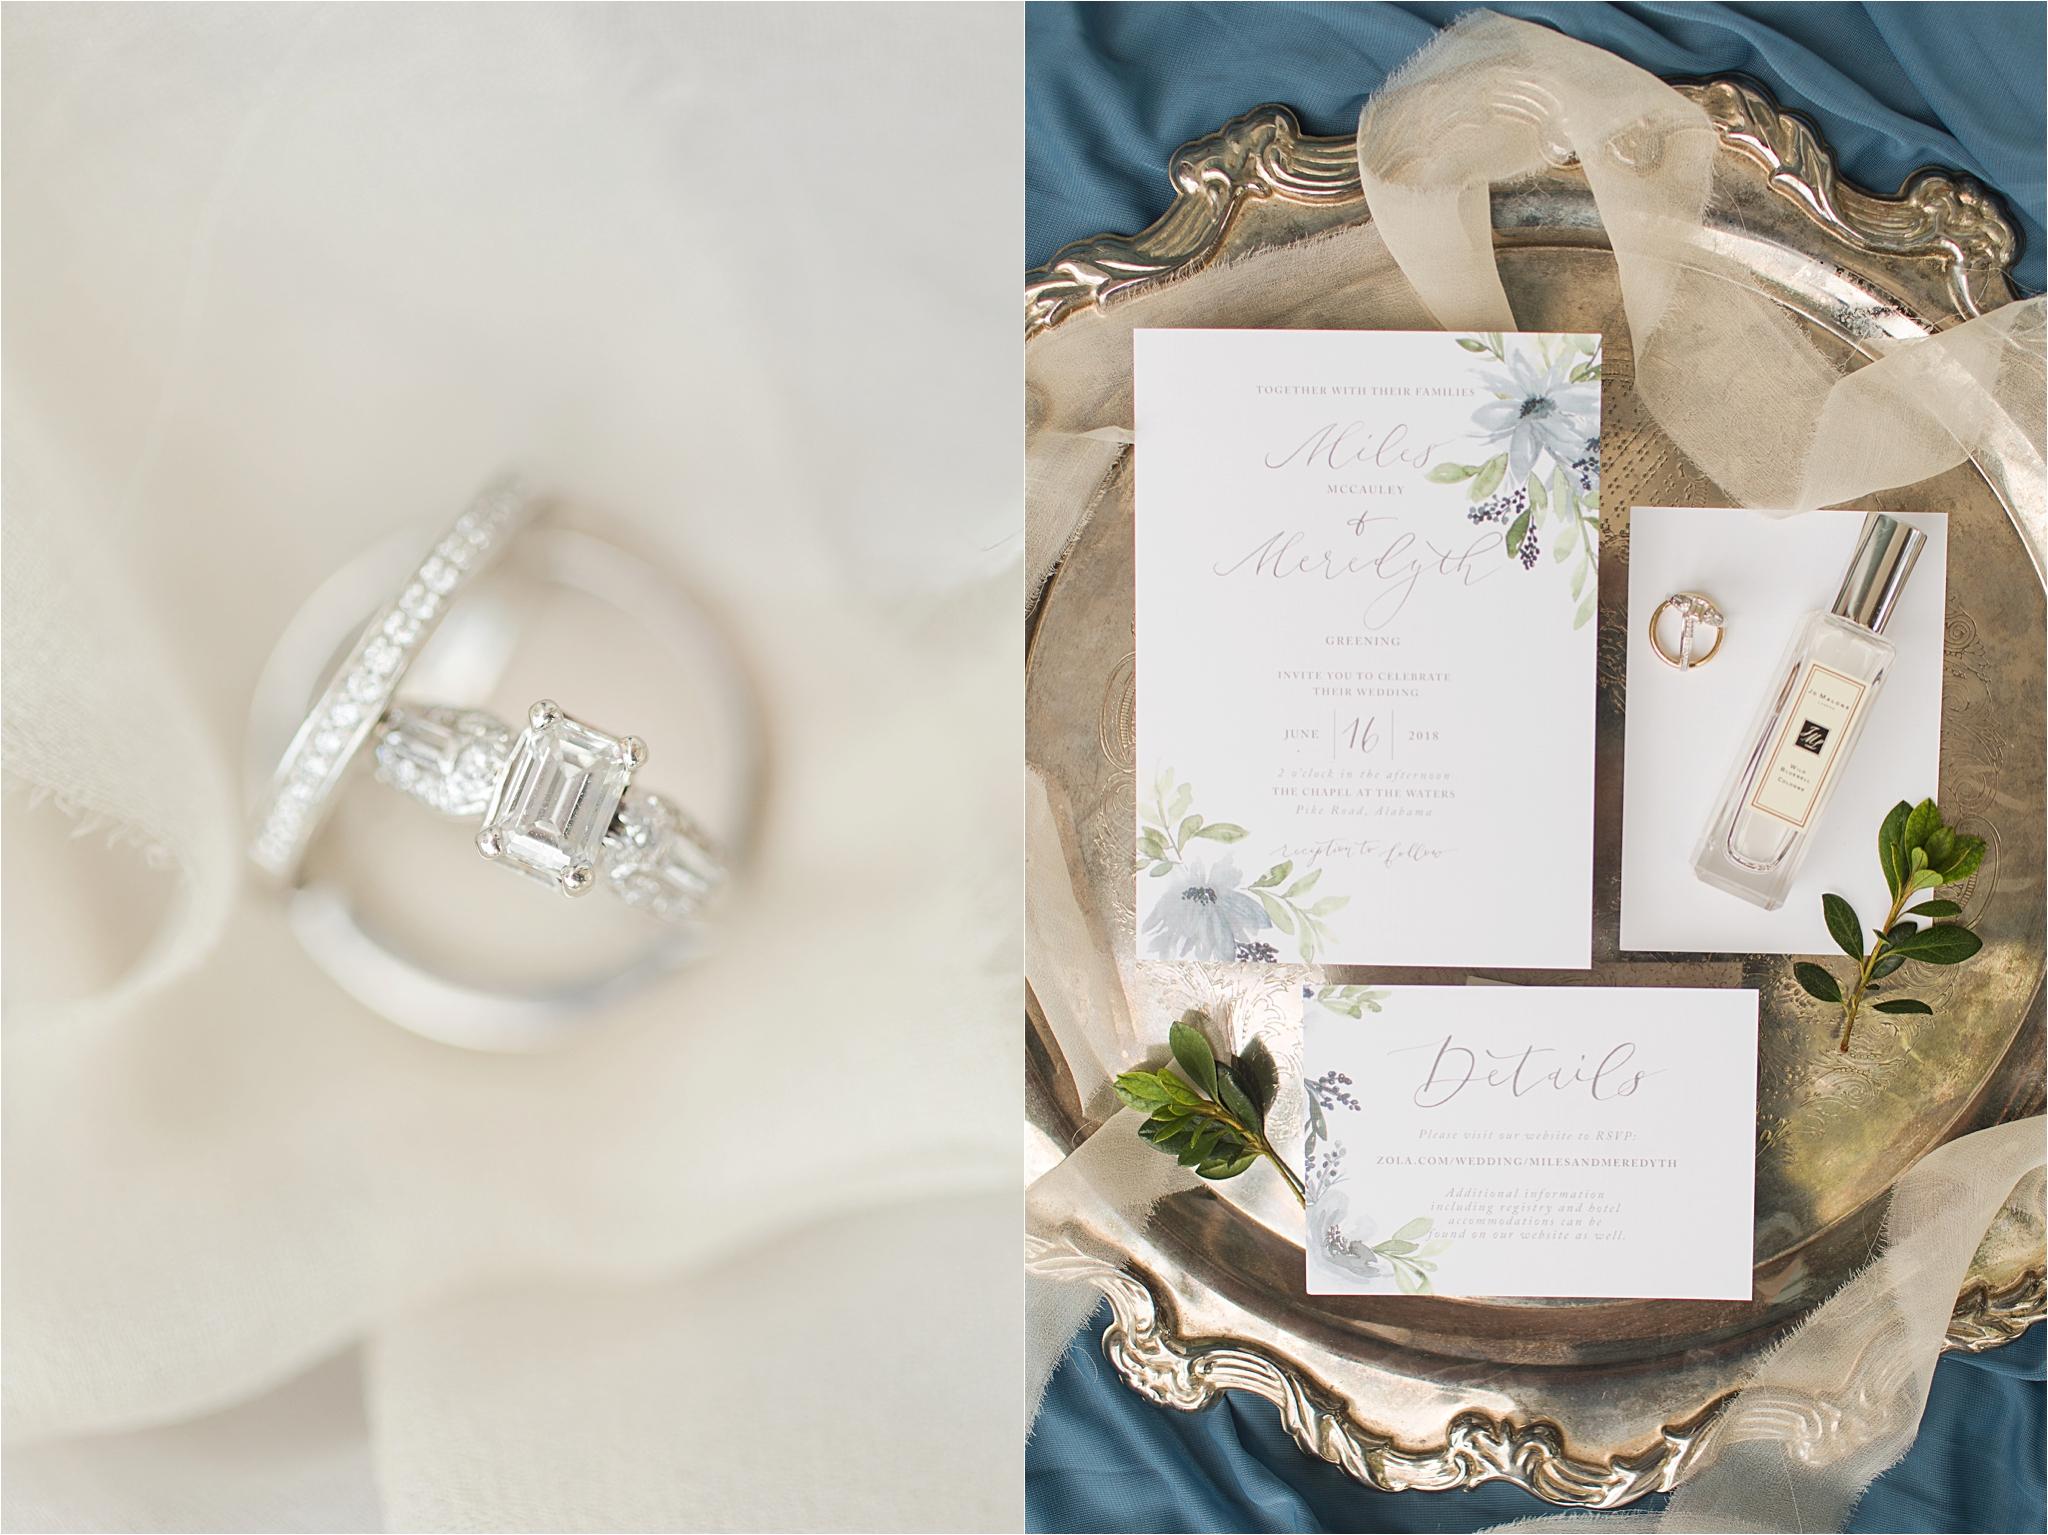 Wedding Details-Pastel Themed Wedding-The Chapel at the Waters-Montgomery Alabama Photographer-Miles & Meredyth-Alabama Bride-Wedding Rings-Blue Themed Wedding